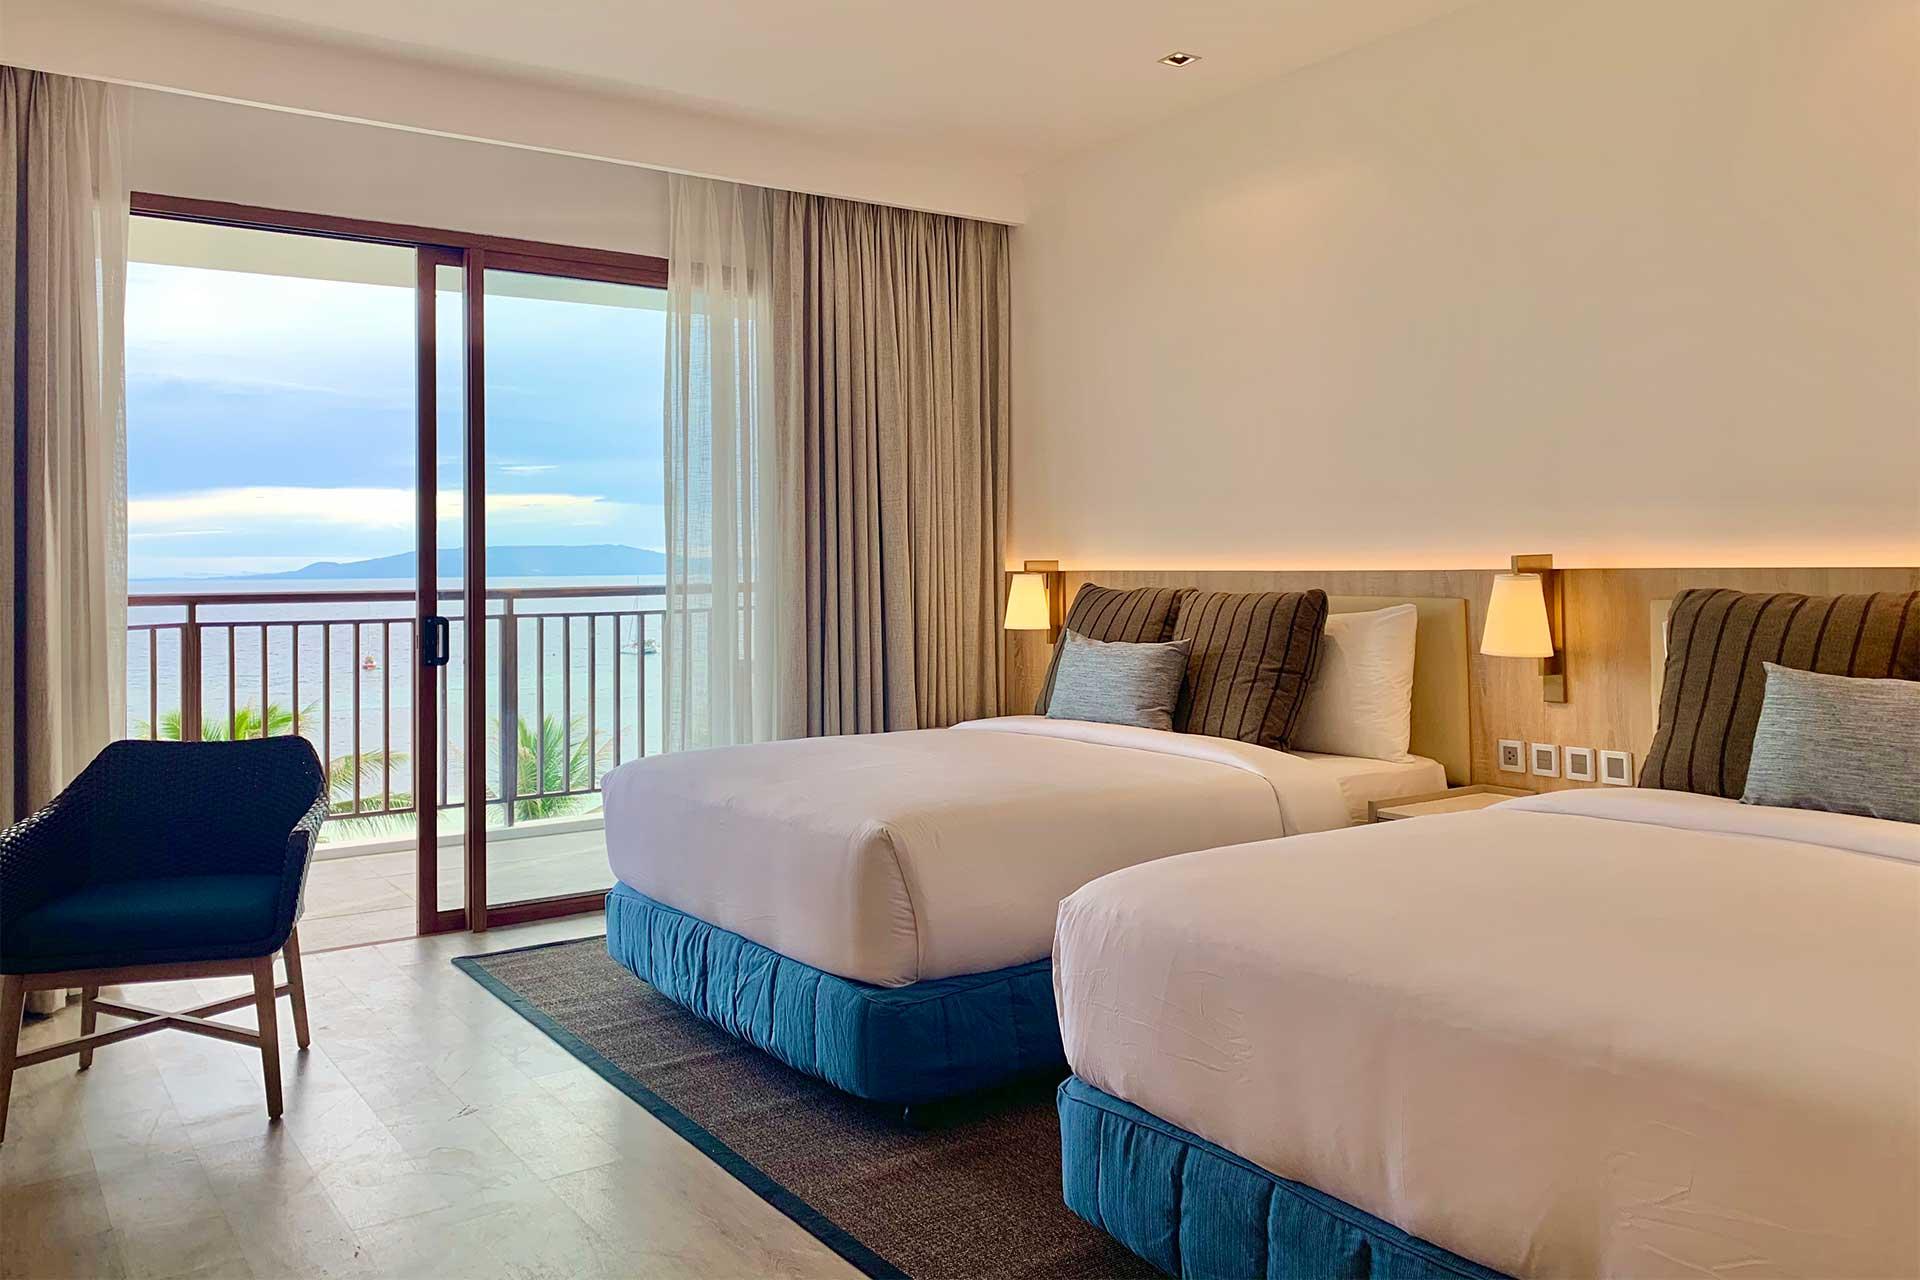 Lantaw Ocean Room